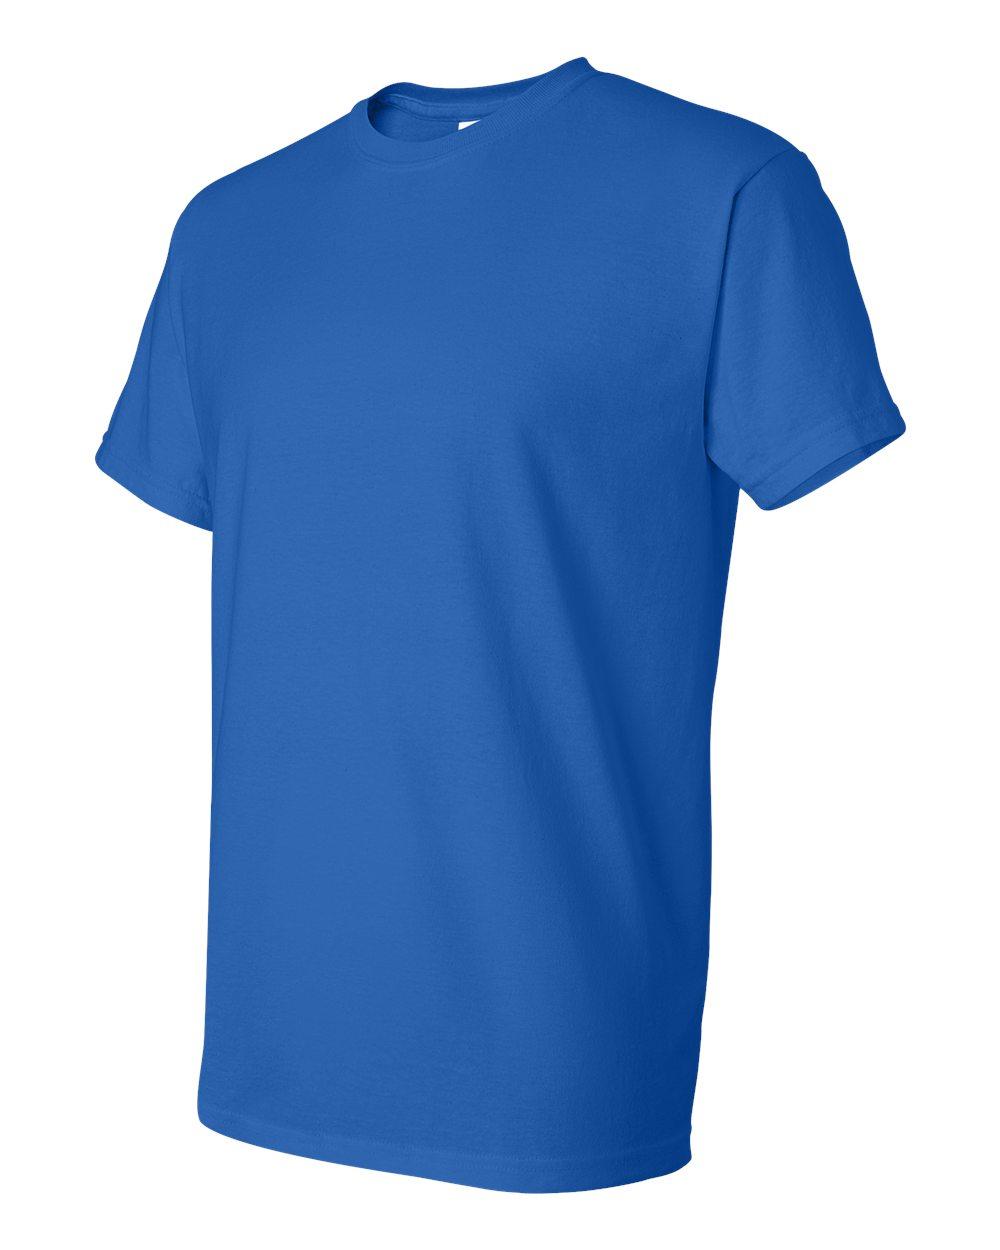 Gildan 8000 dryblend 50 50 t shirt friendly arctic for Gildan t shirt printing